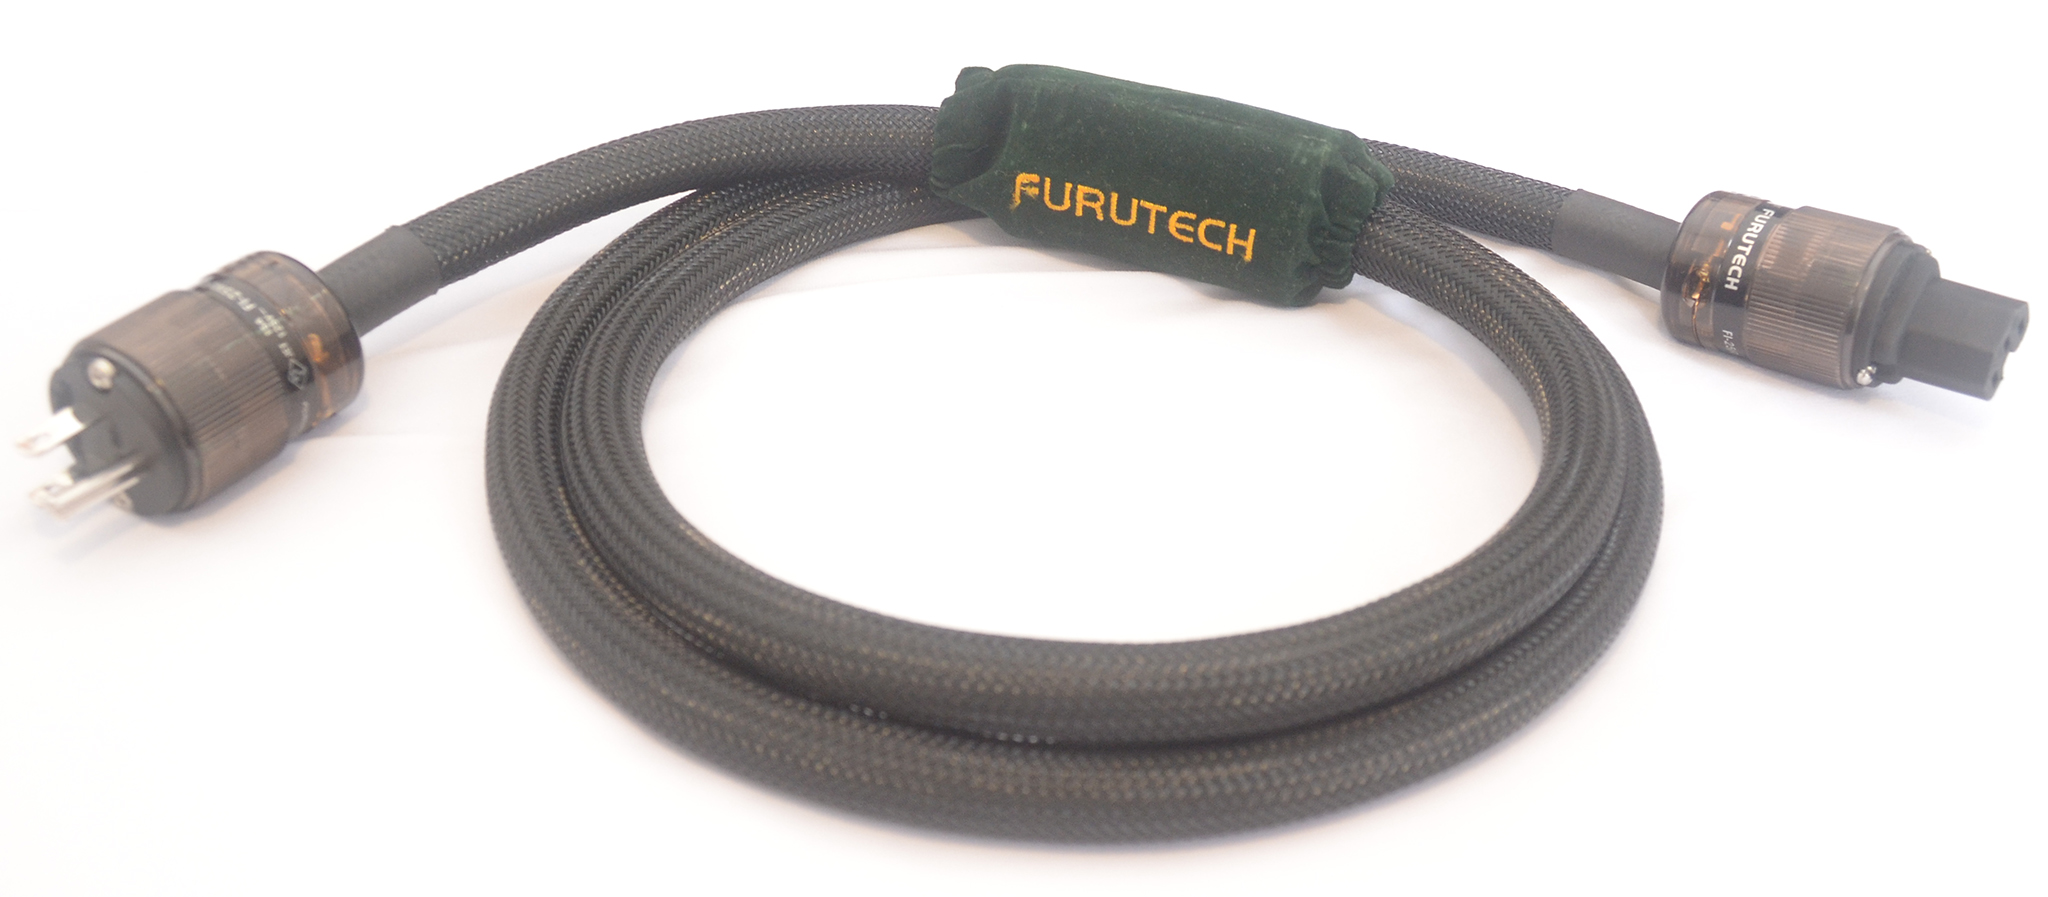 Furutech Reference III 4R